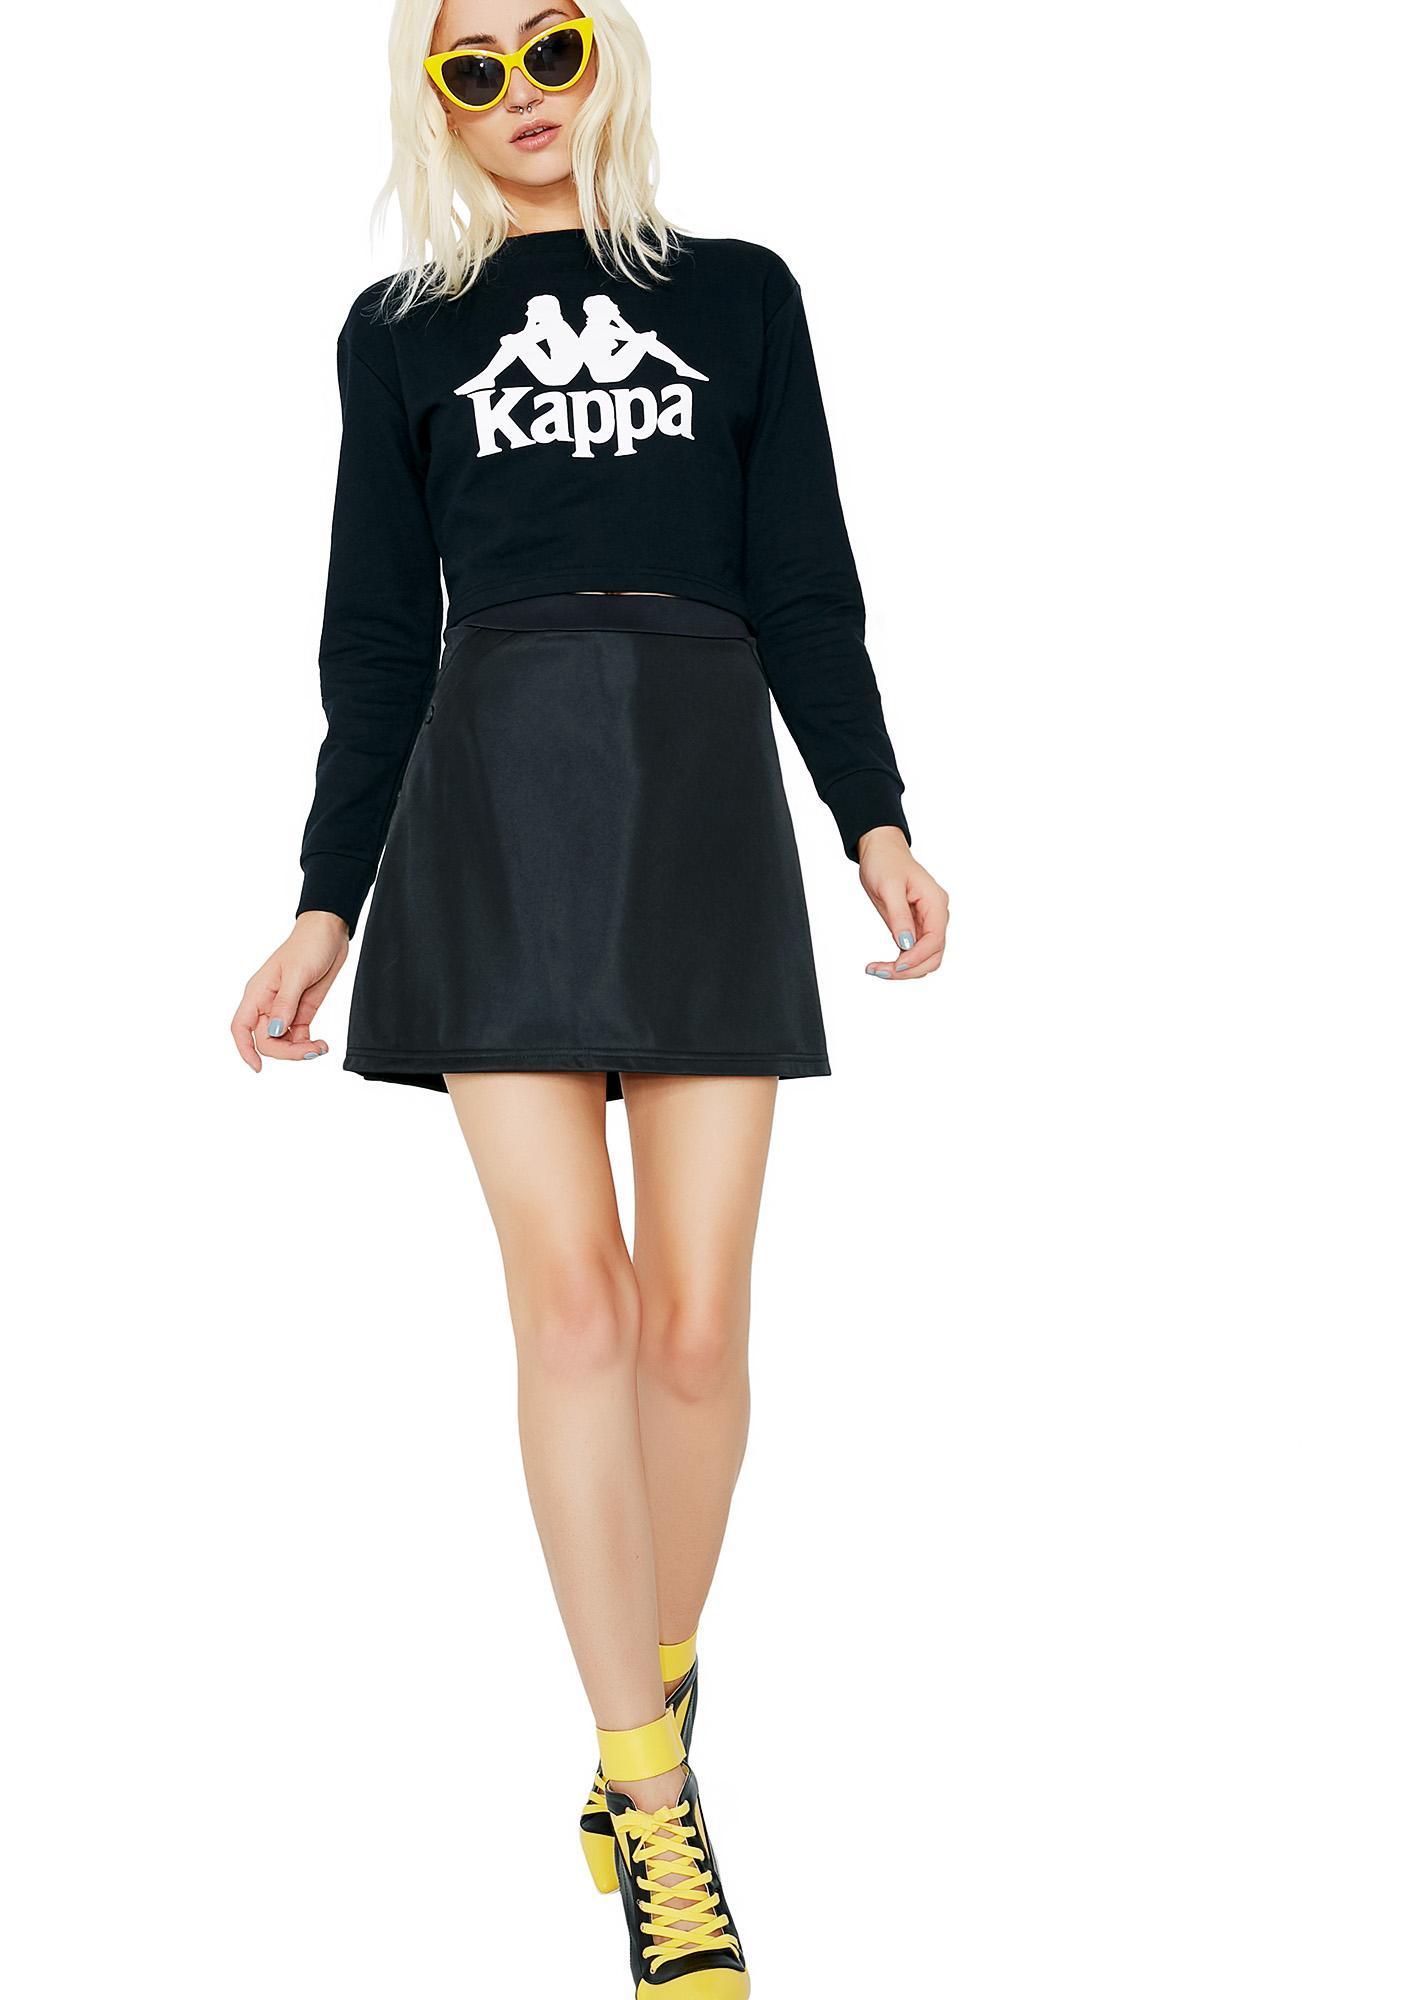 Kappa Authentic Jubblie A-Line Mini Skirt